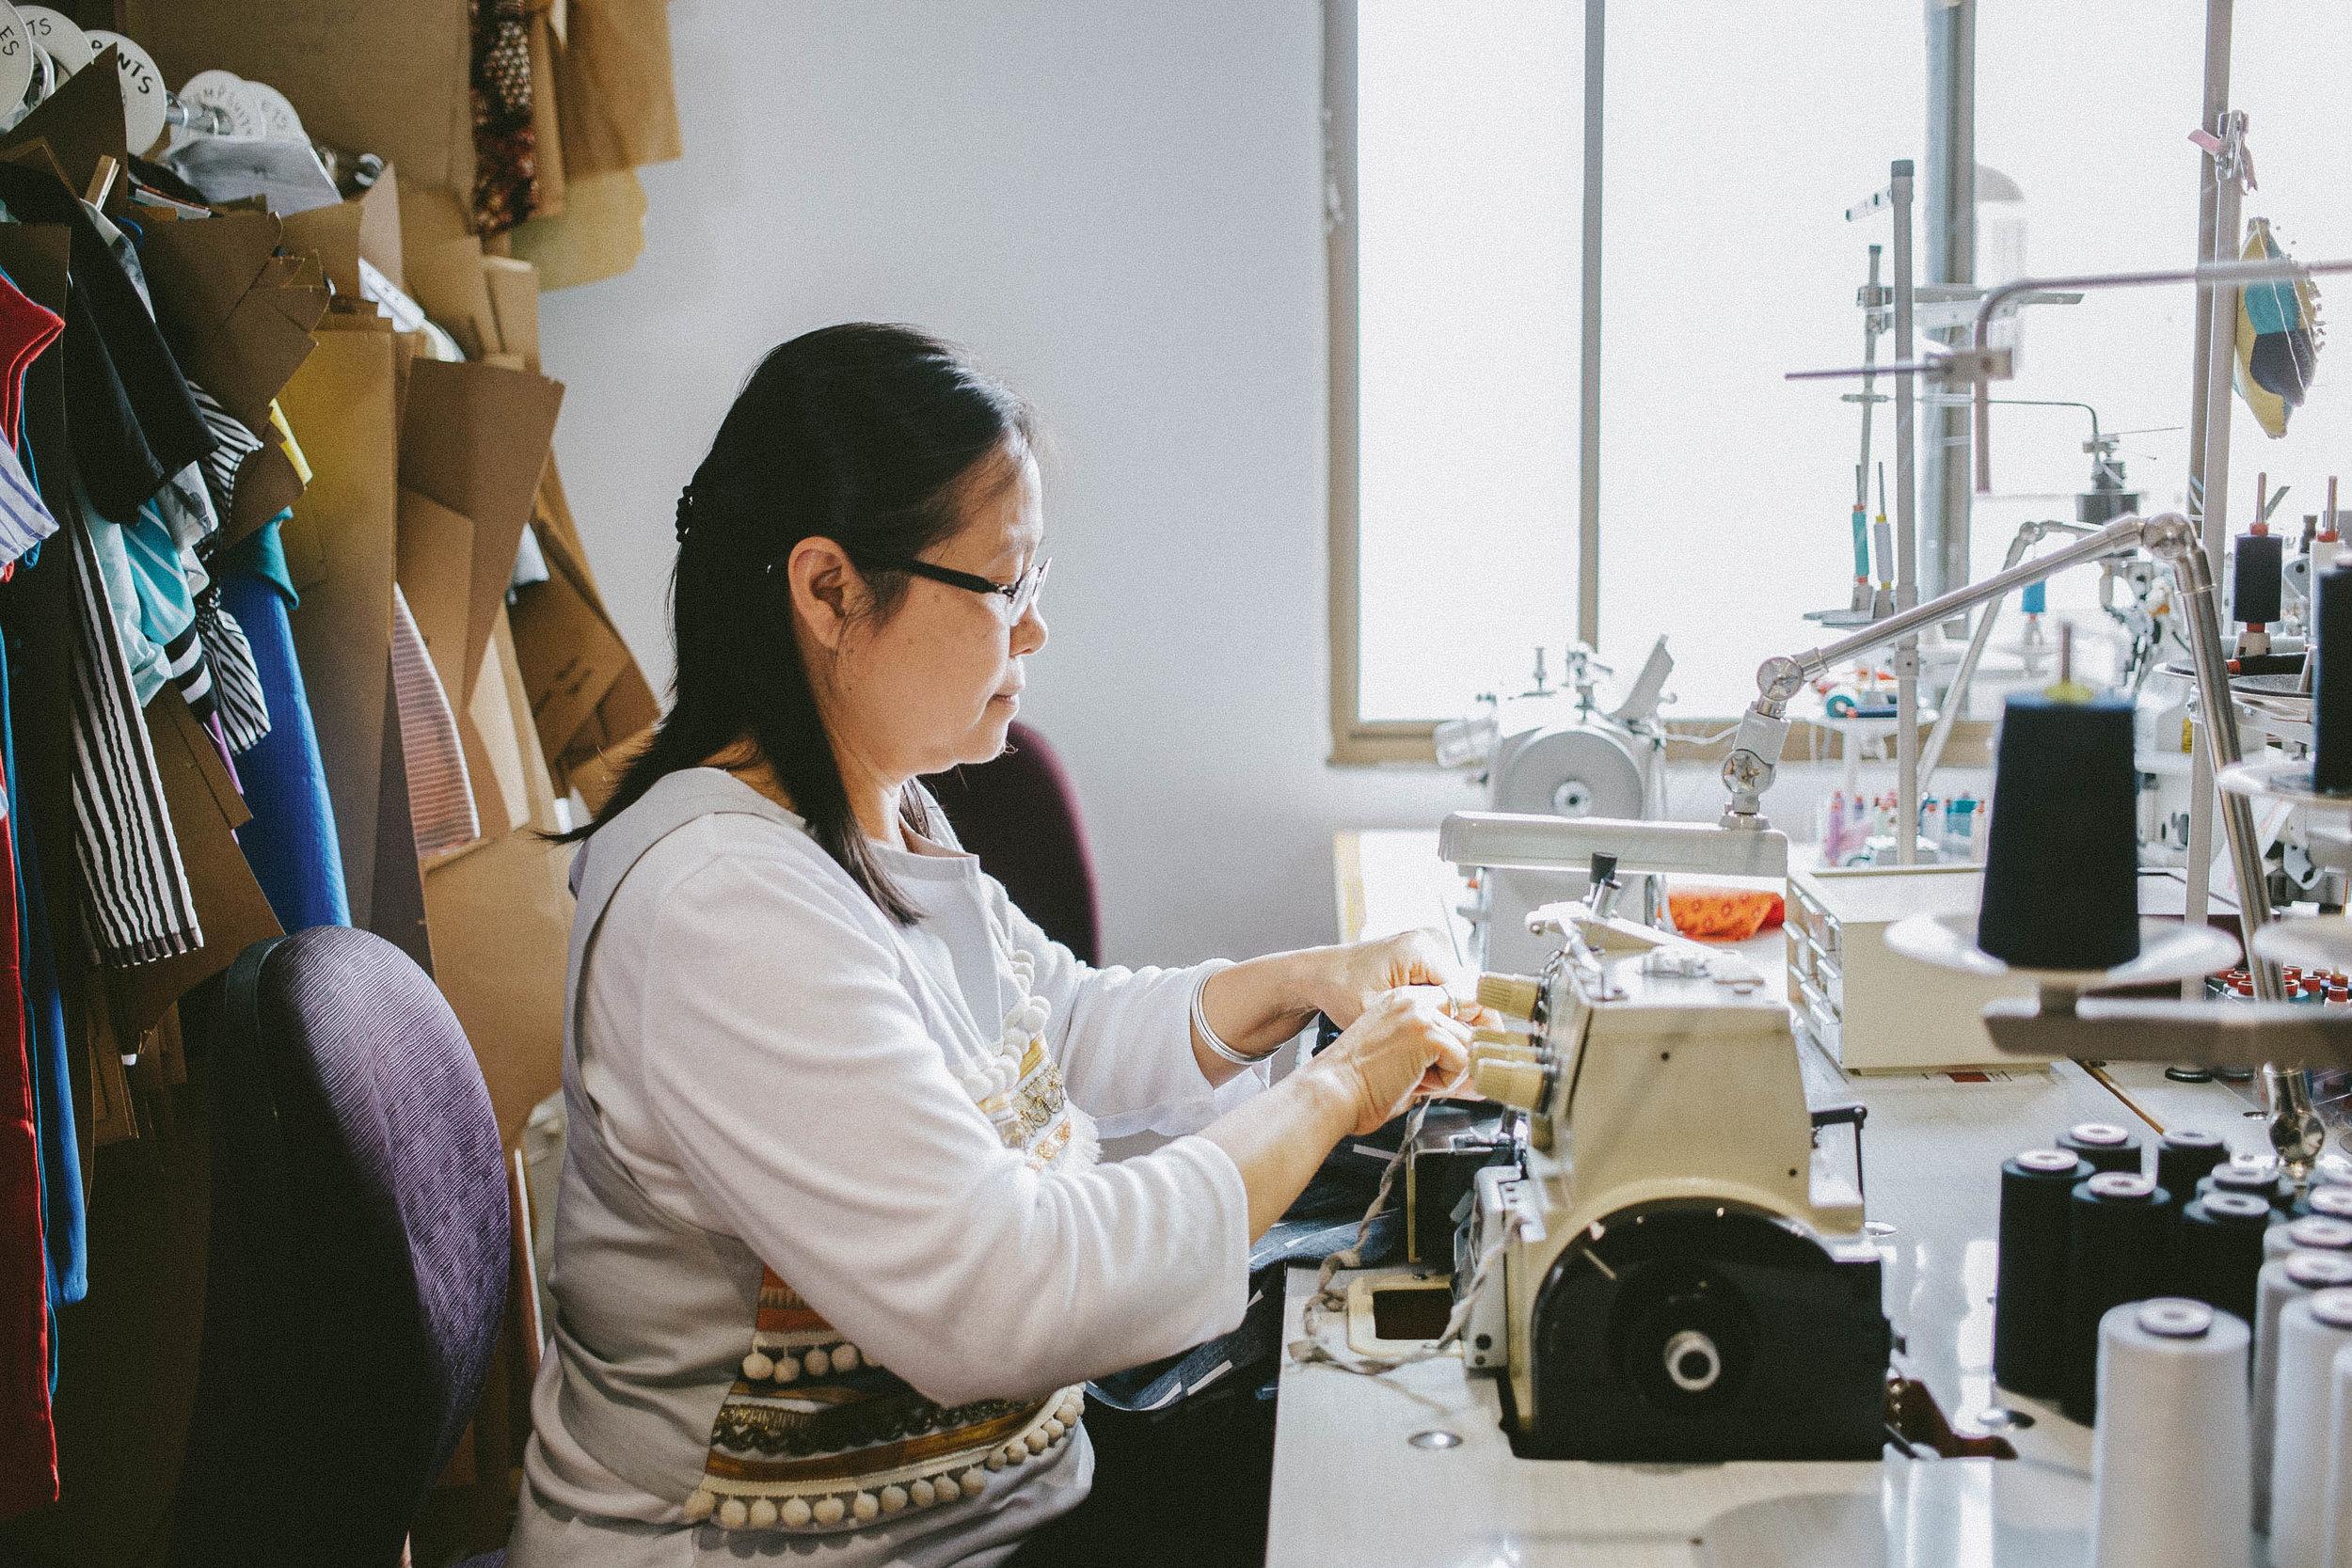 TSO sewing technician Naw Esther Han. • Photo by Luisa Brimble